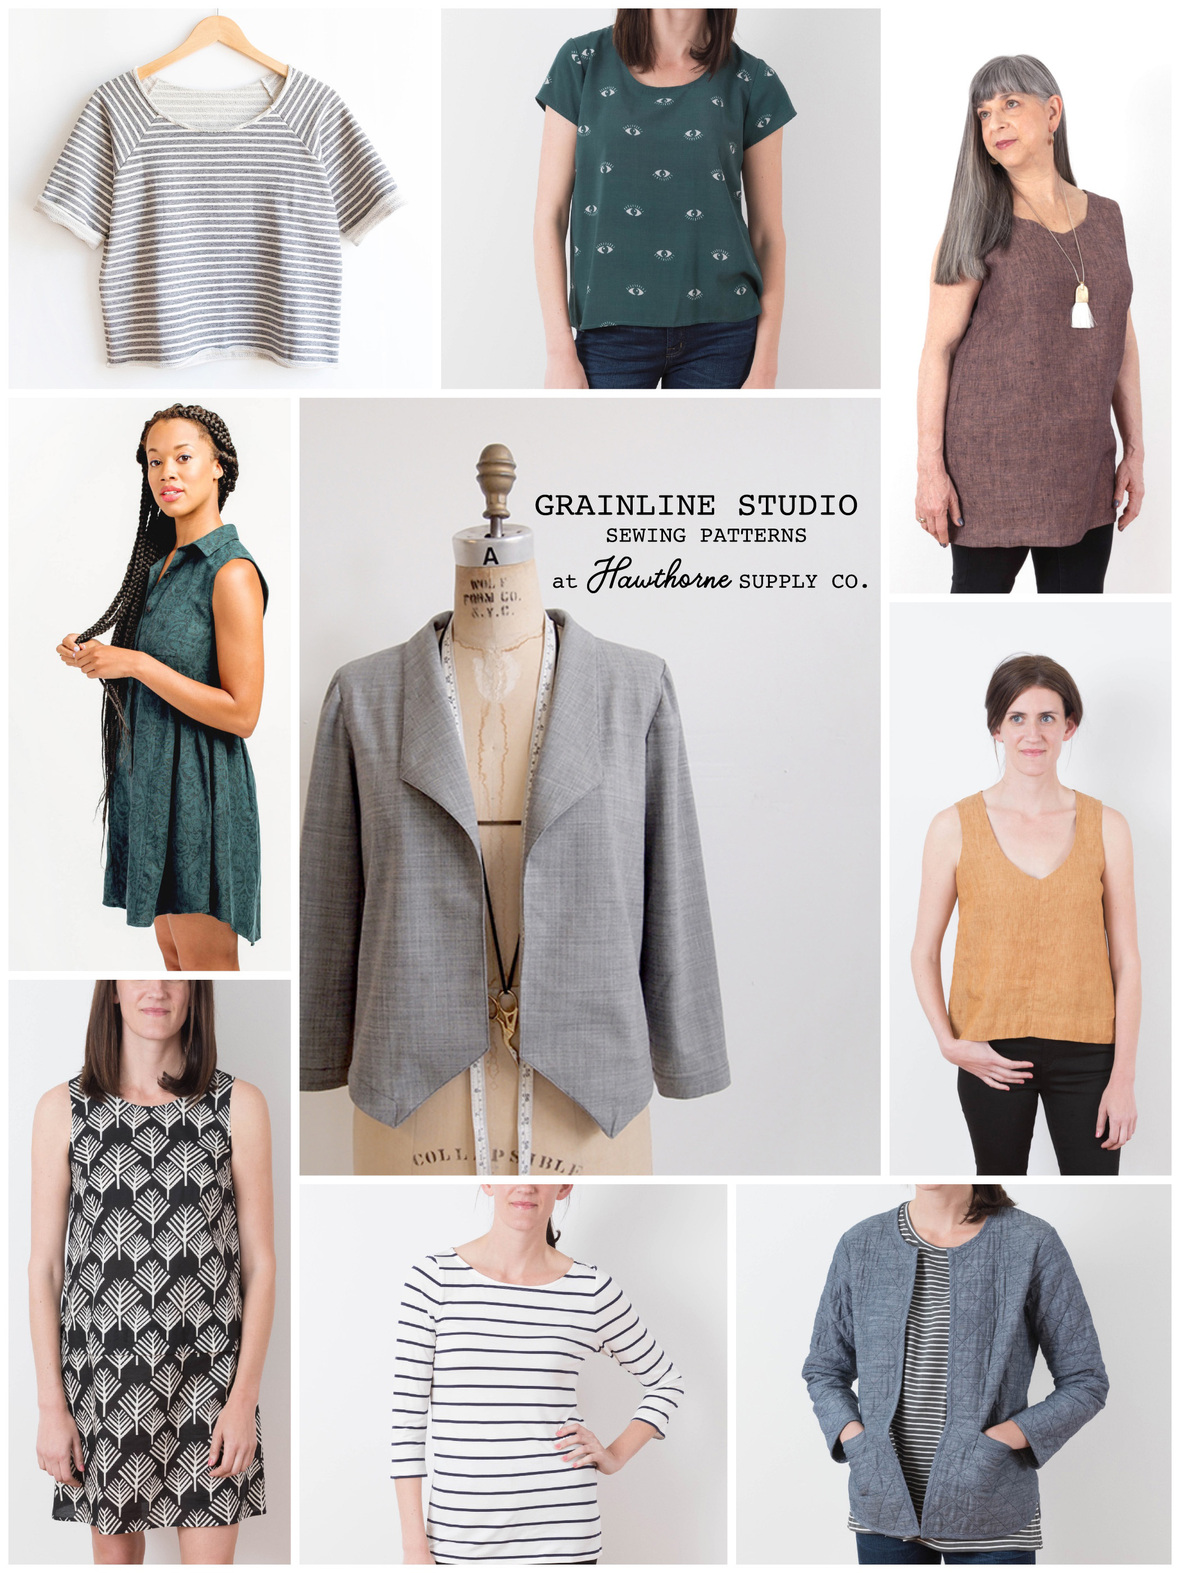 Grainline Studio Patterns at Hawthorne Supply Co